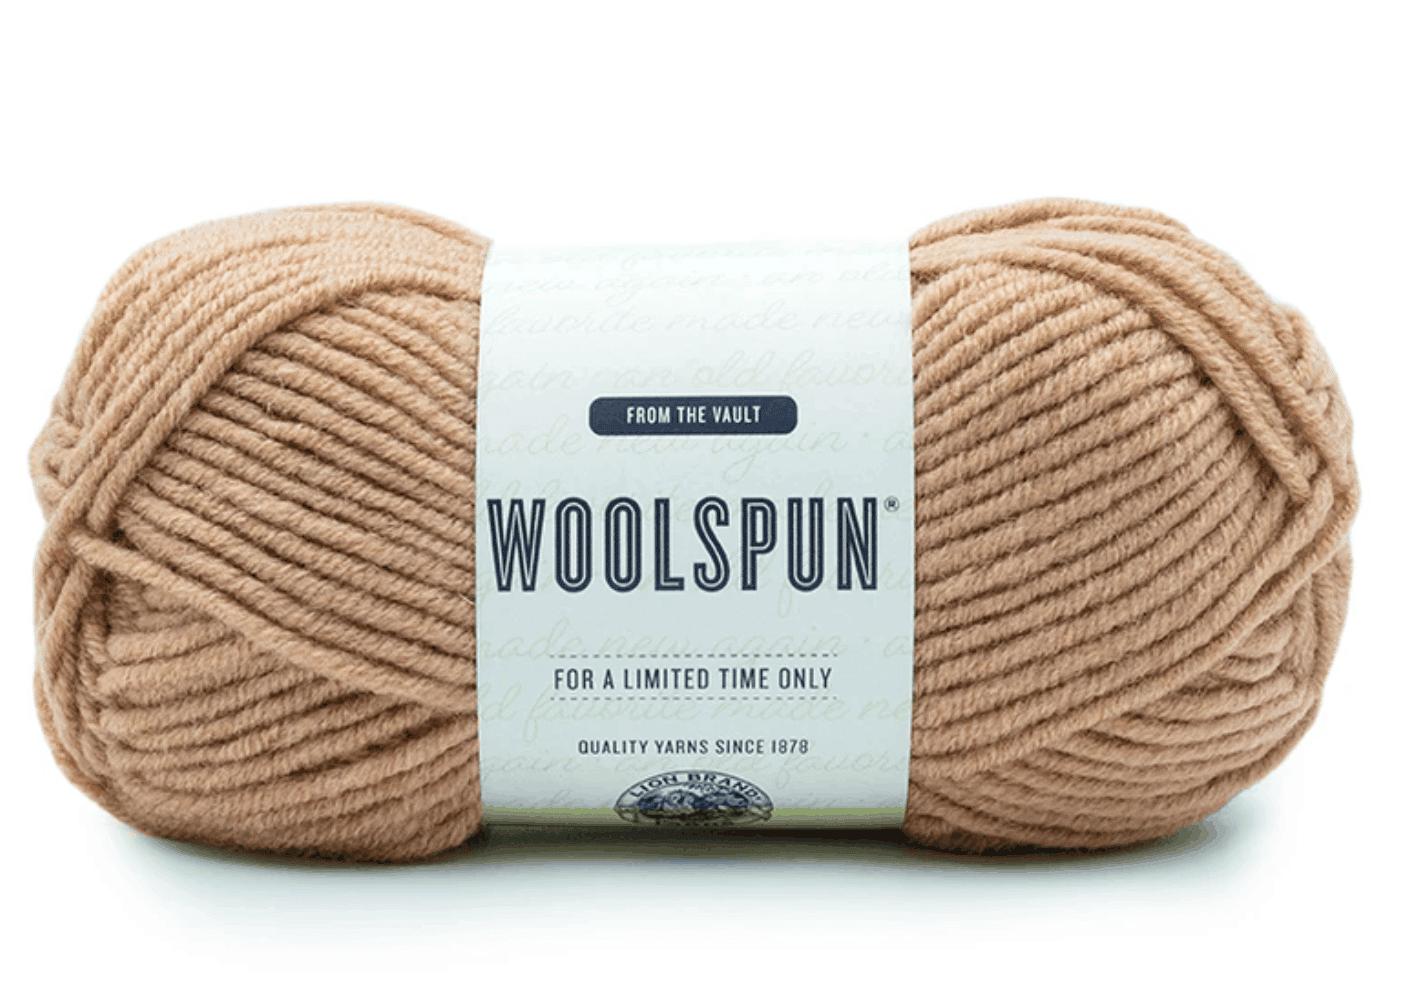 Lion's Pride Woolspun